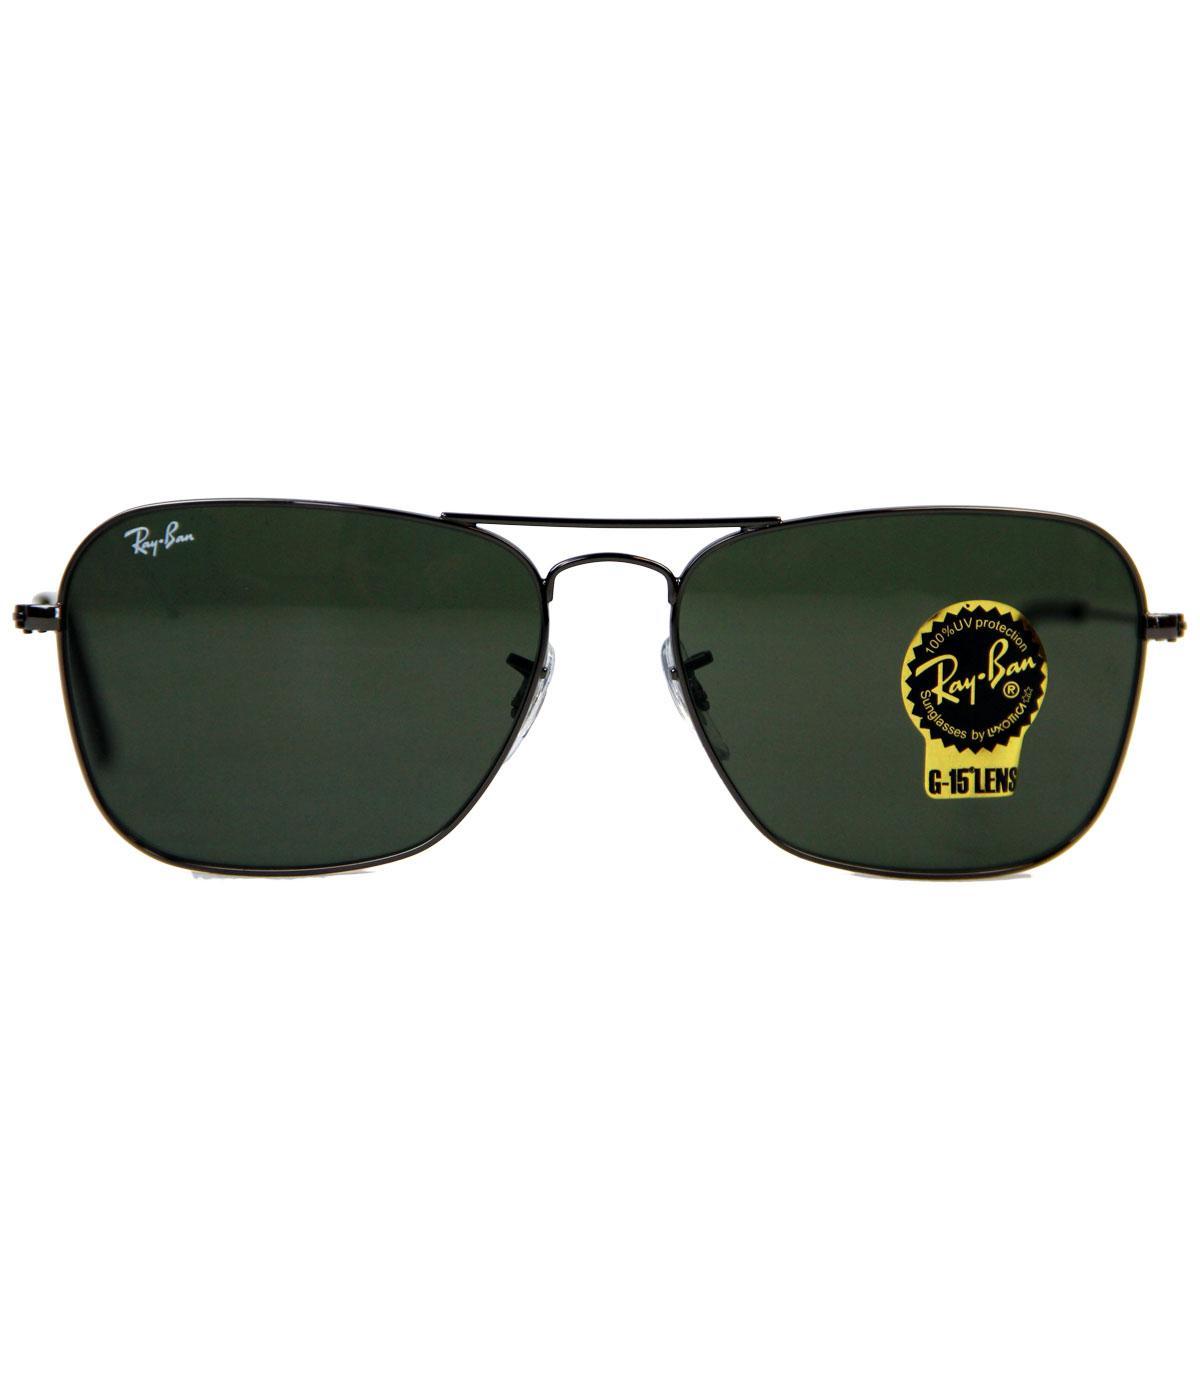 ray ban caravan on sale  ray ban sunglasses retro mod caravan gunmetal